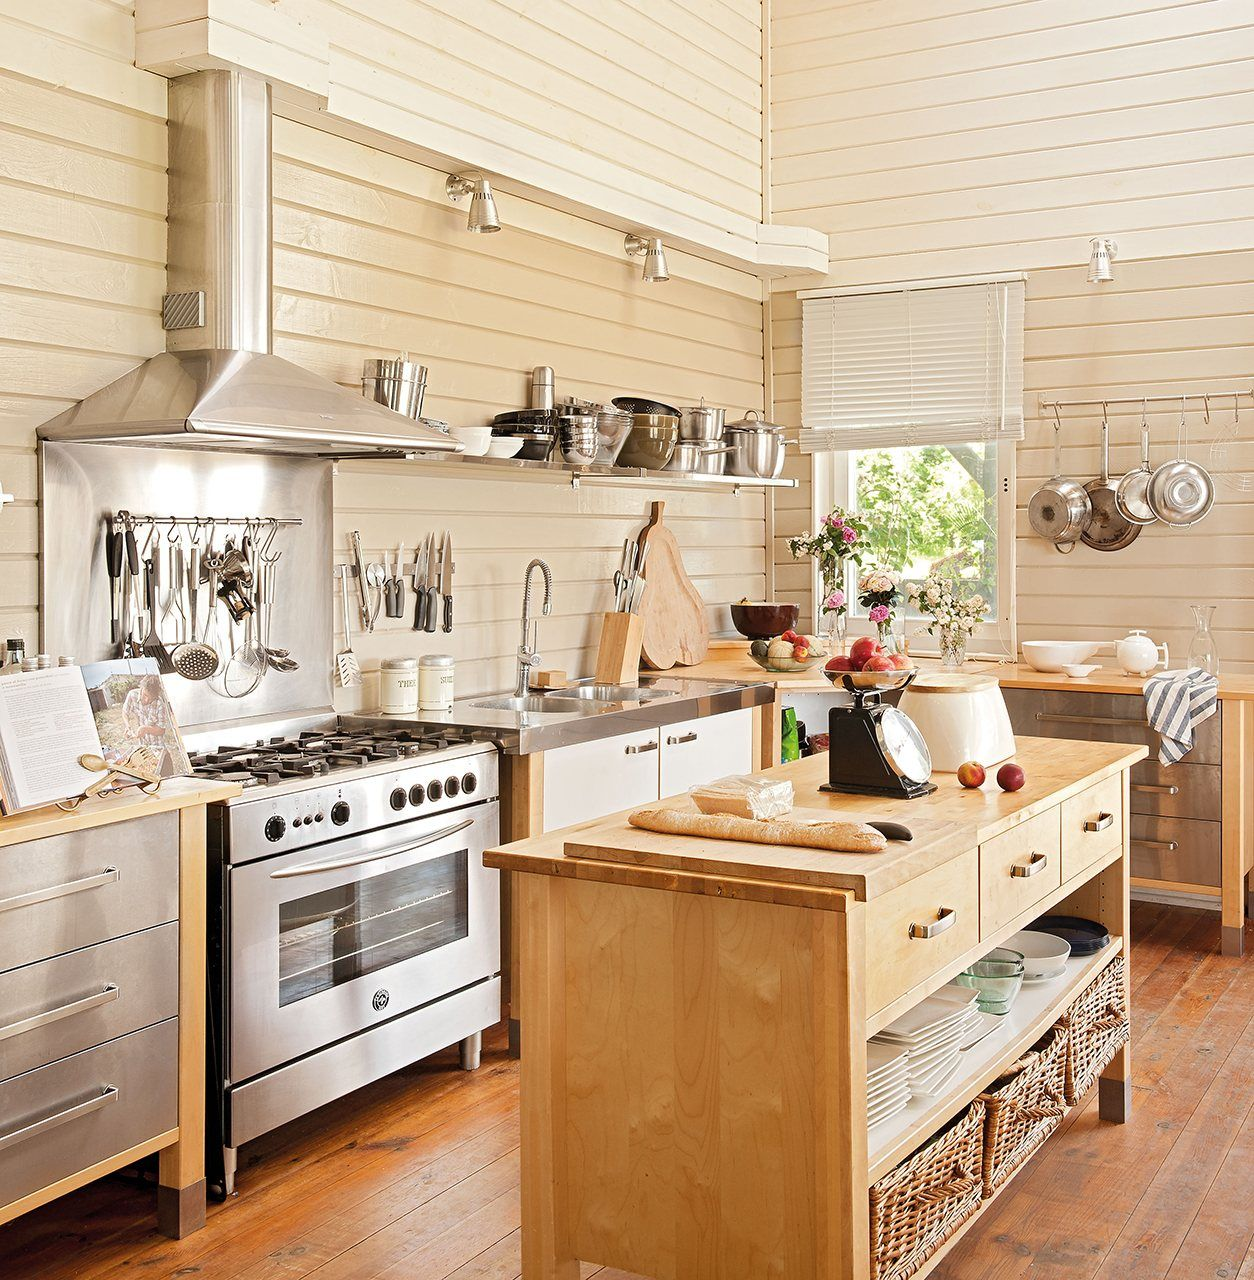 Värde Küche Ikea. Küche Arbeitsplatte Konfigurator Outdoor Verputzen ...